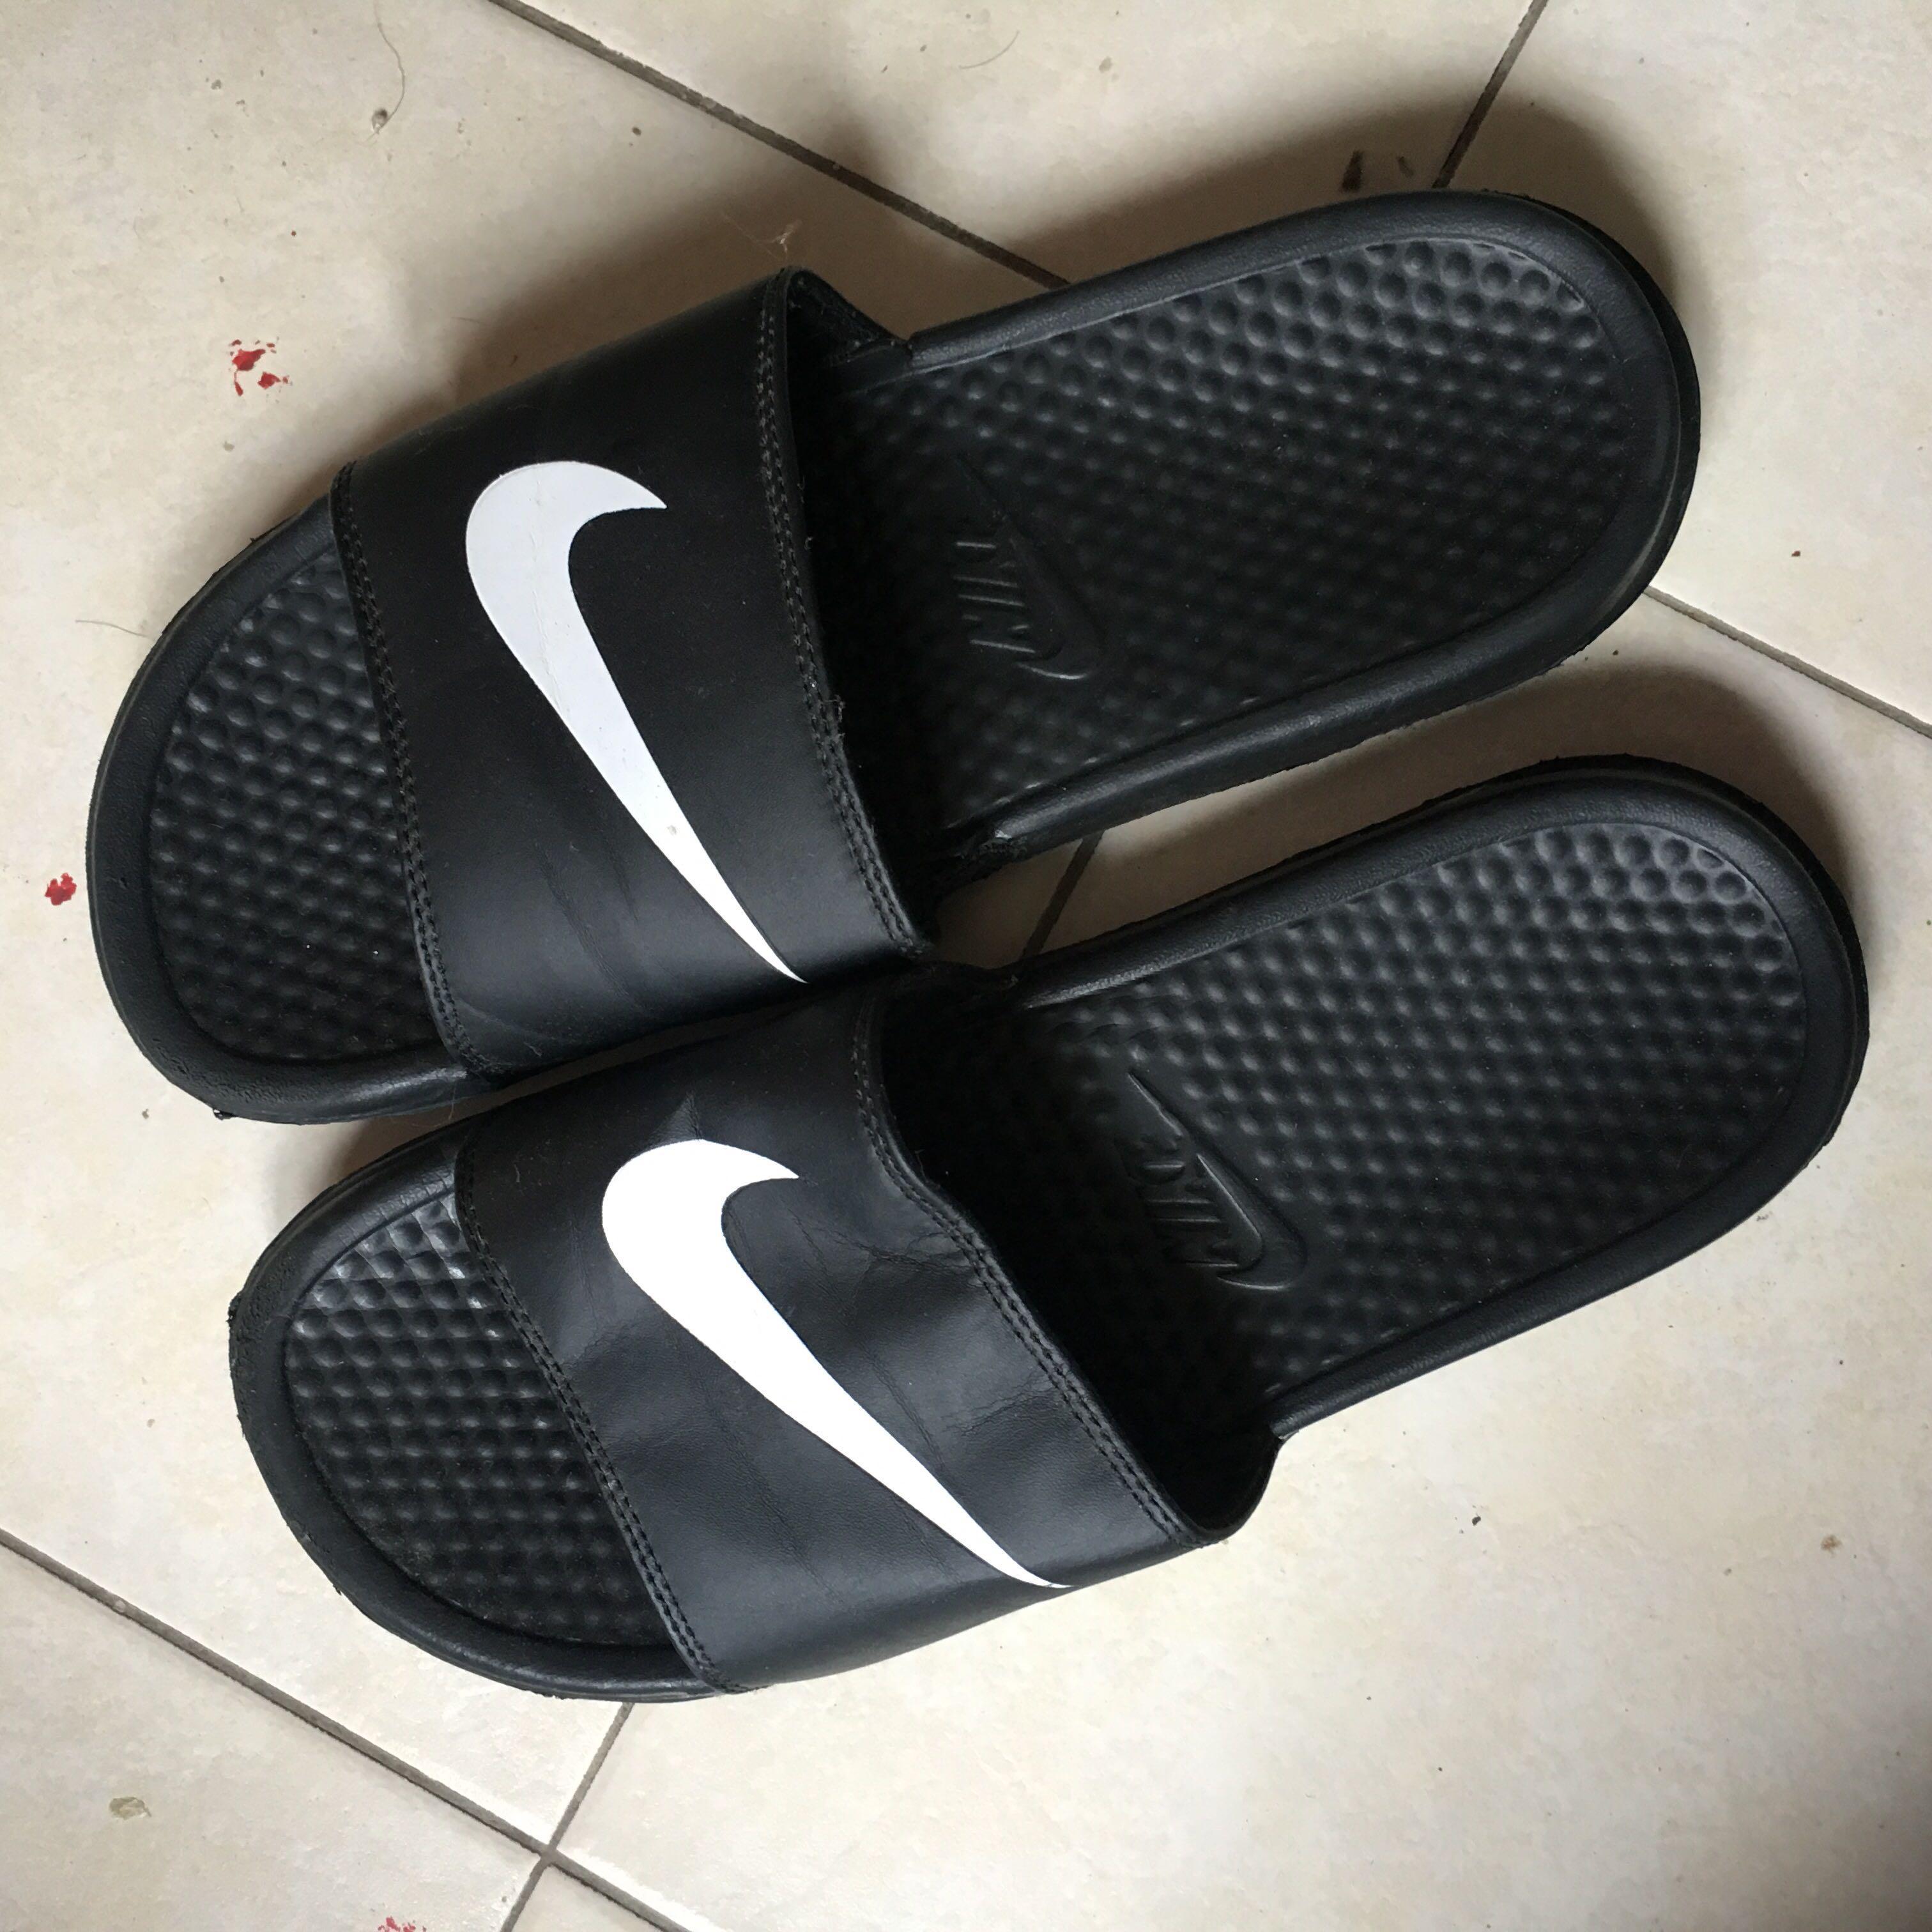 official photos 8dfa6 a4d8e Nike Benassi Swoosh Slides, Men's Fashion, Footwear ...